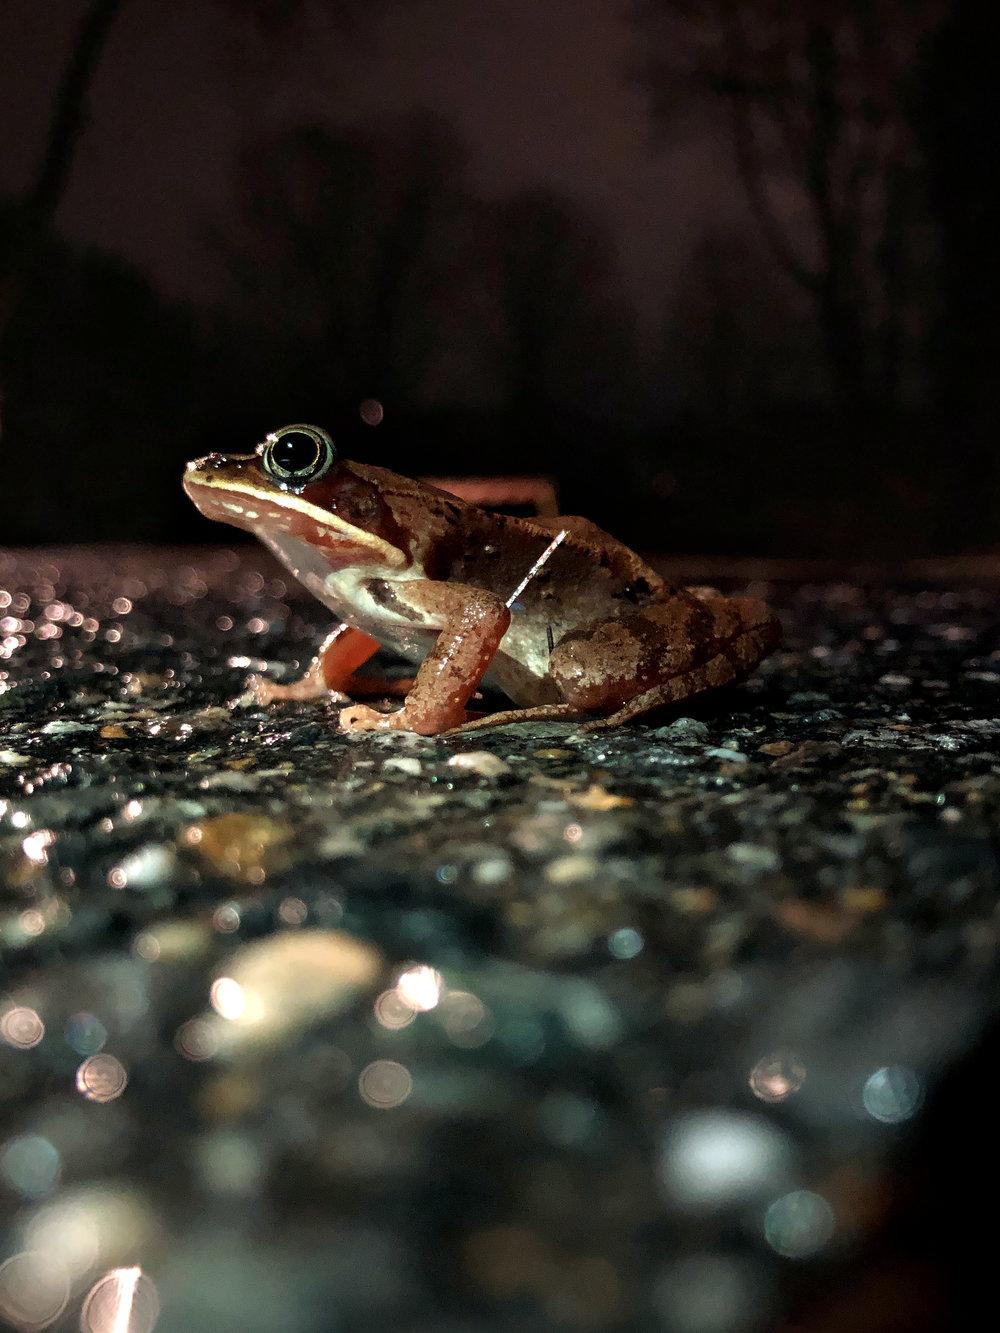 A volunteer's flashlight lights up a migratory wood frog. (Anna Miller/Animalia Podcast)